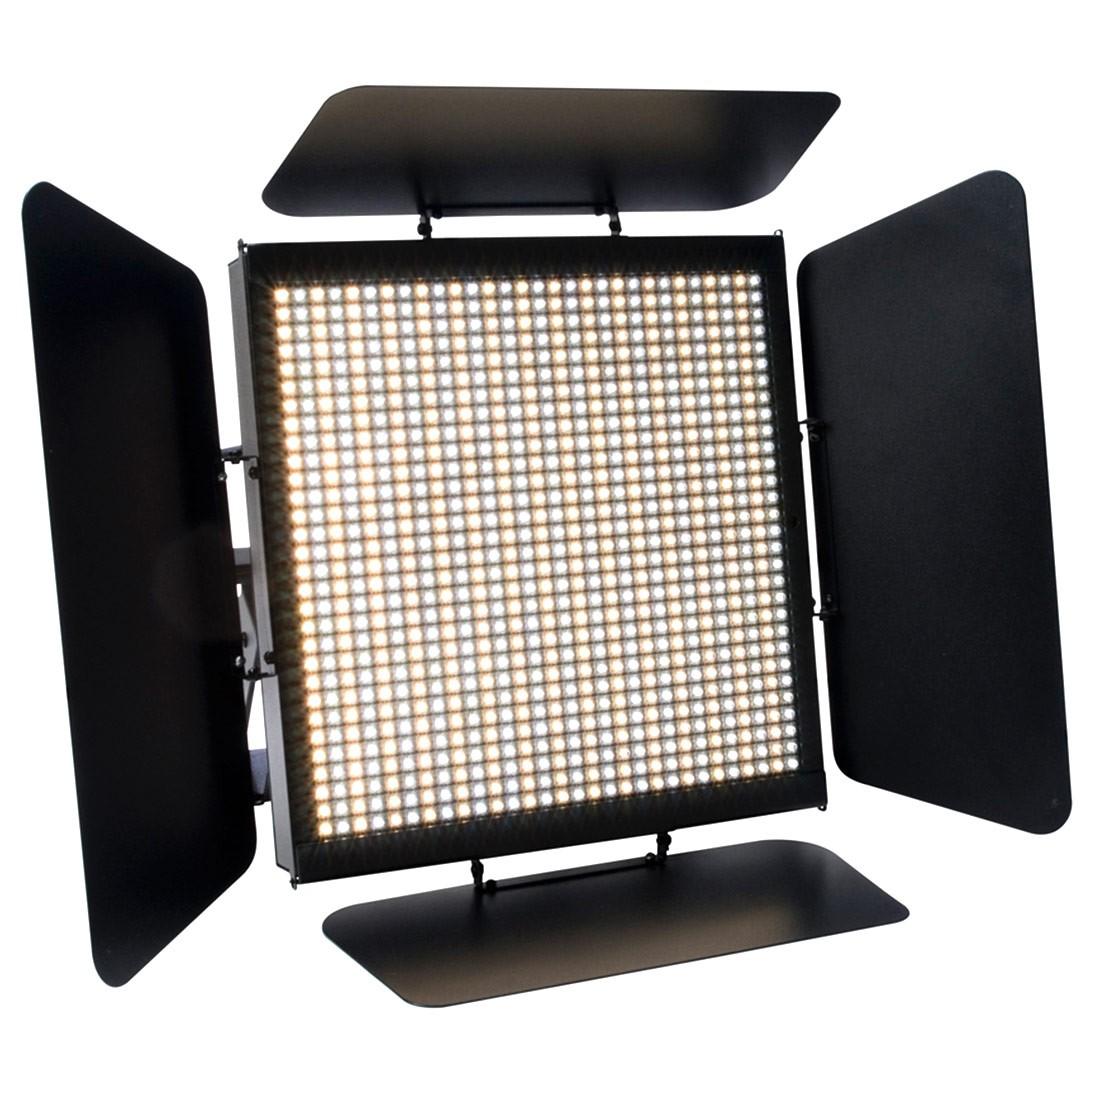 Elation TVL2000 II High 92Cri 90W Ultimate Broadcast LED TV Light Panel with 450 Warm & Cool White LEDs (TVL601)